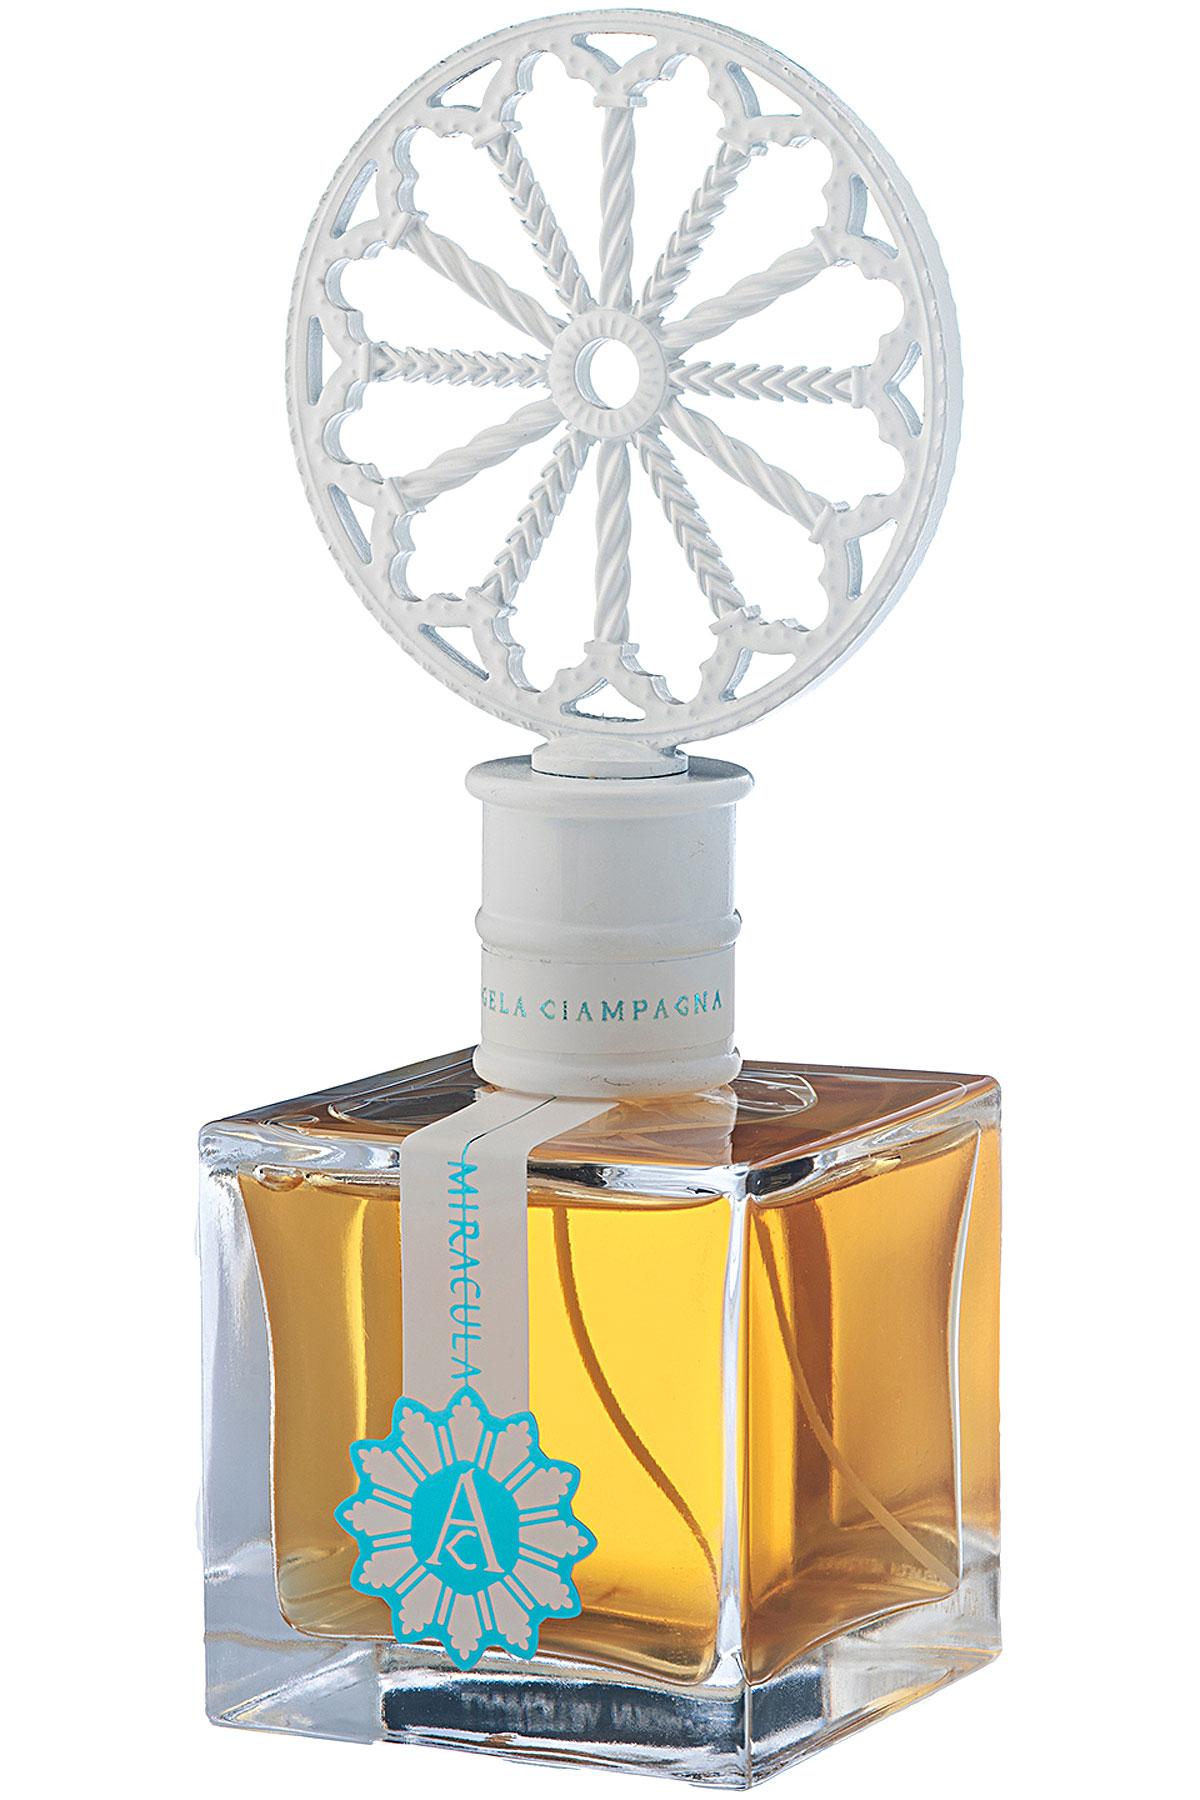 Angela Ciampagna Fragrances for Men, Miracula - Extrait De Parfum - 100 Ml, 2019, 100 ml